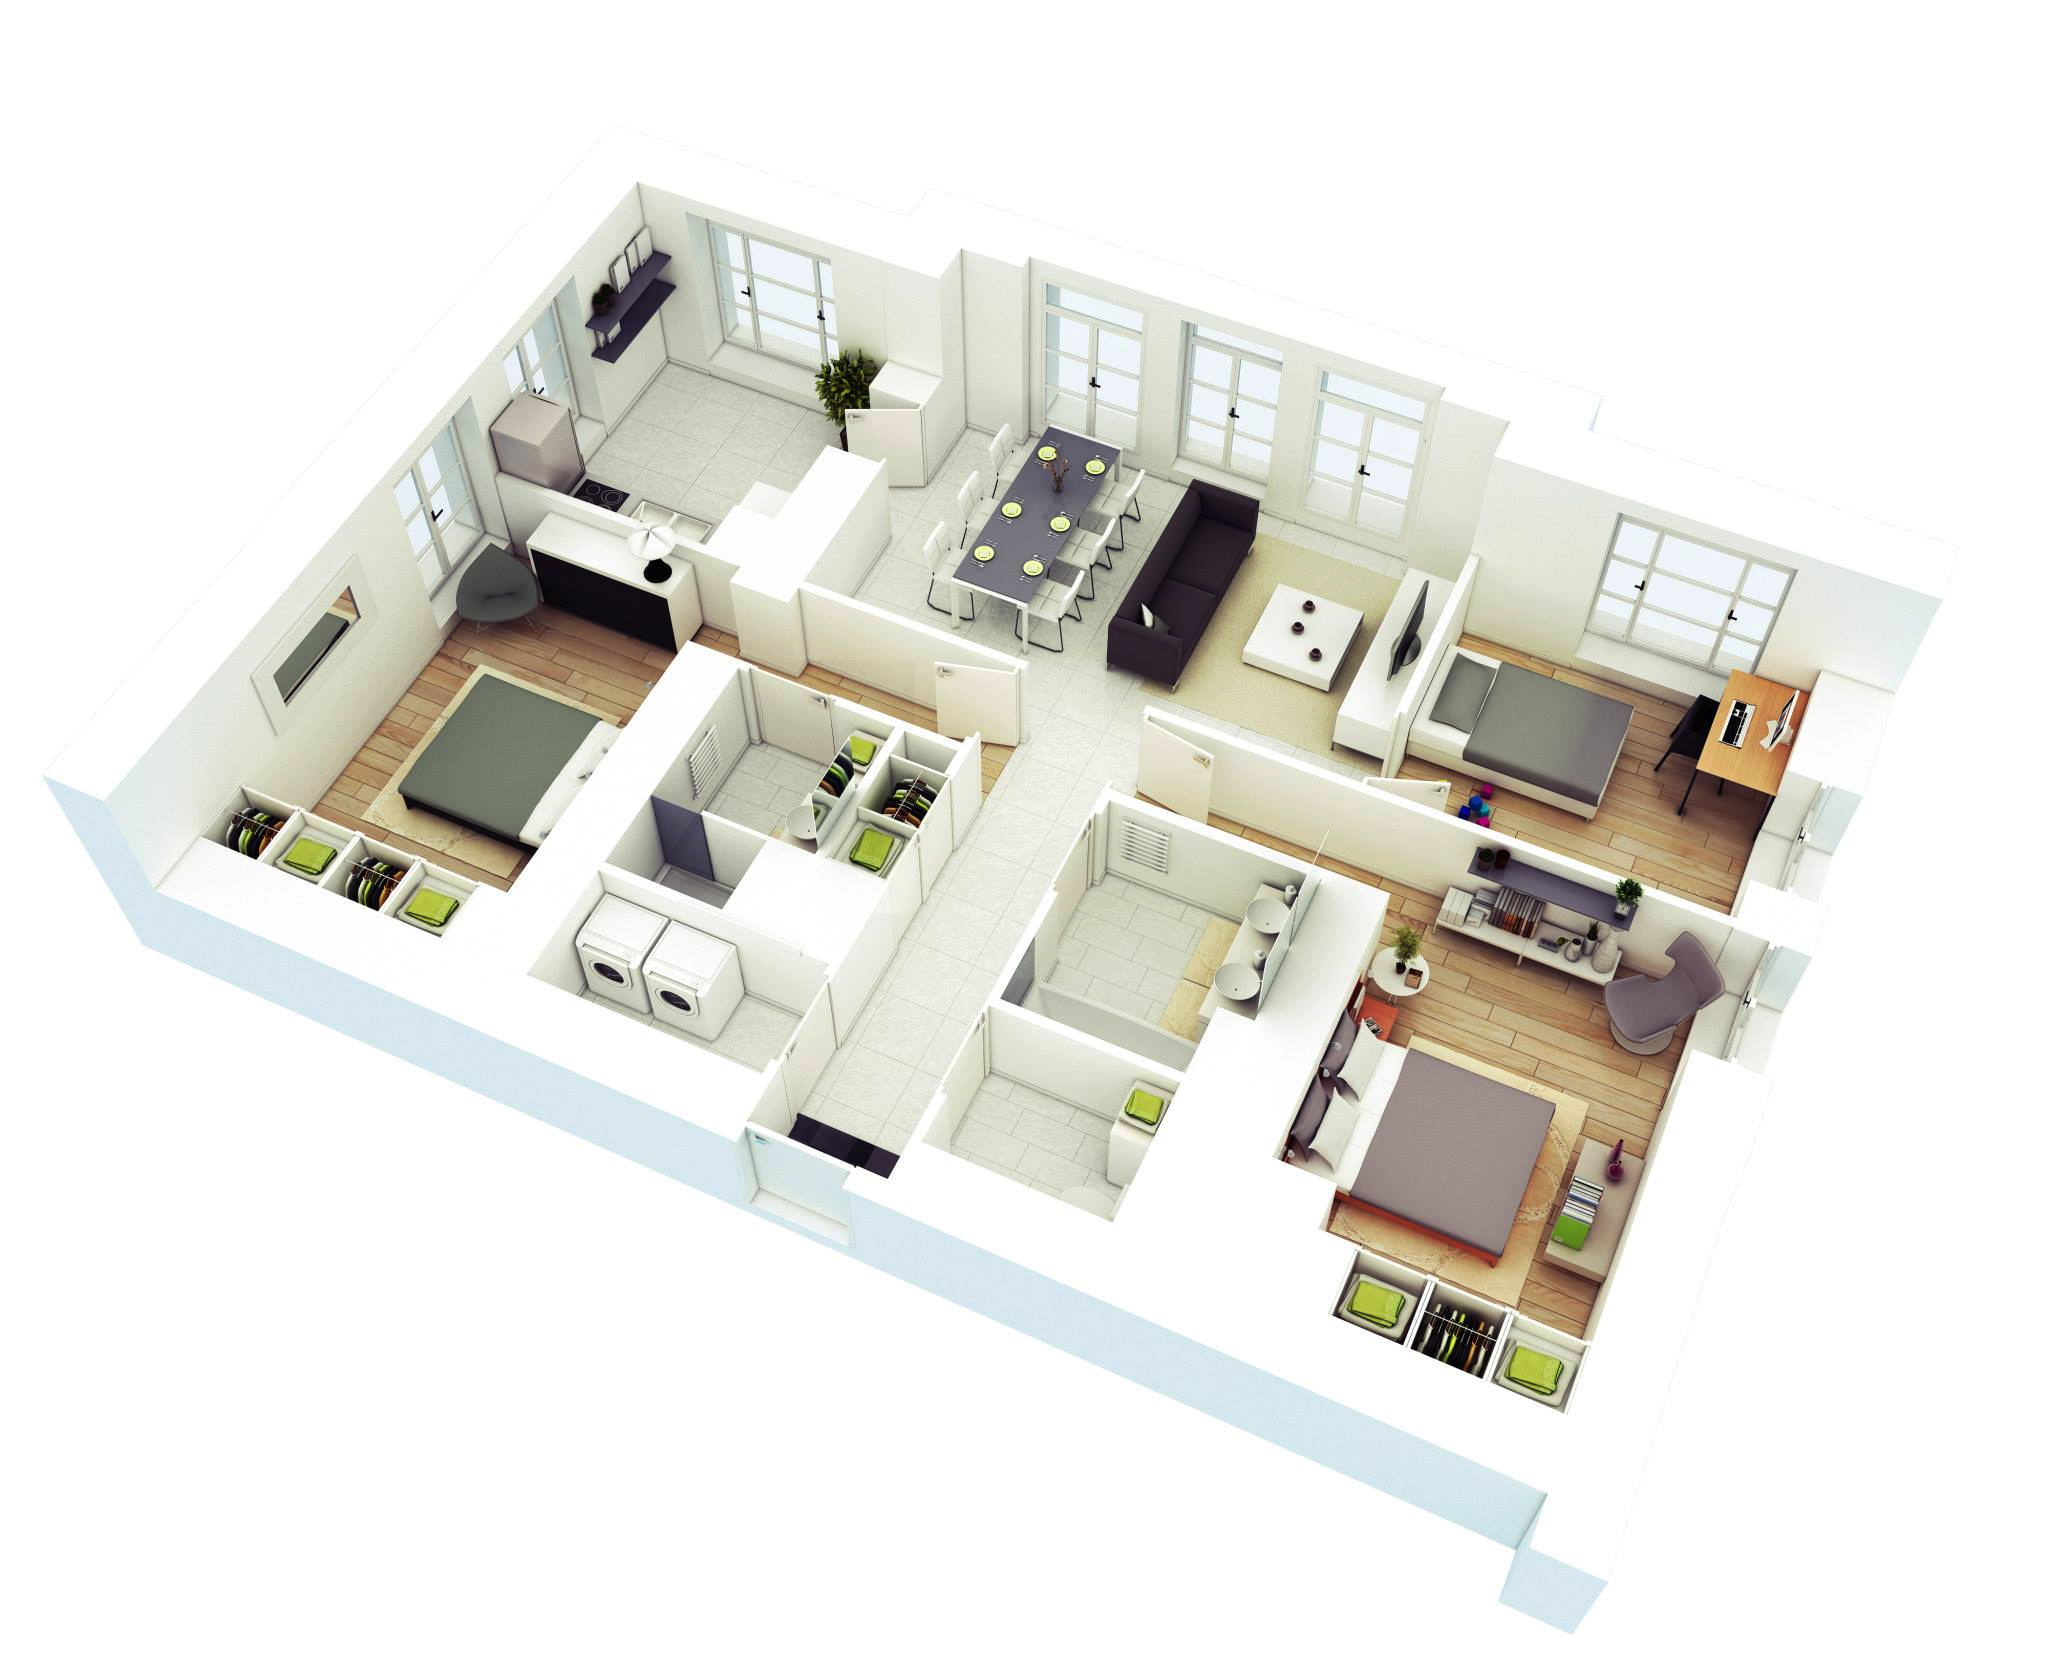 Drawn bedroom 3d classroom Plans Design Floor 3 &